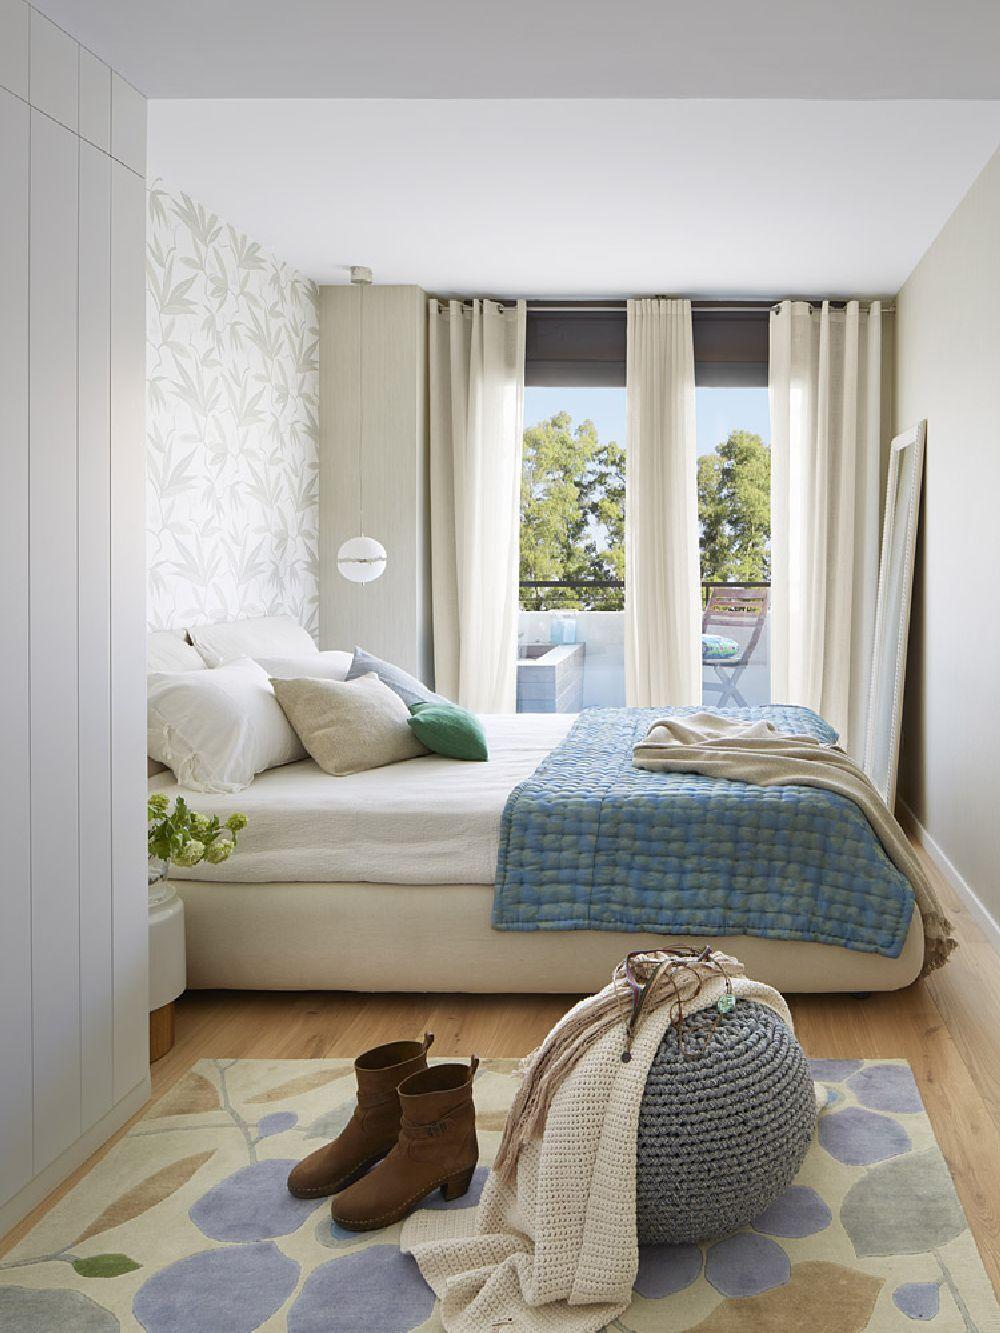 adelaparvu.com despre apartament cu aer mediteranean, design interior Meritxell Ribe (10)